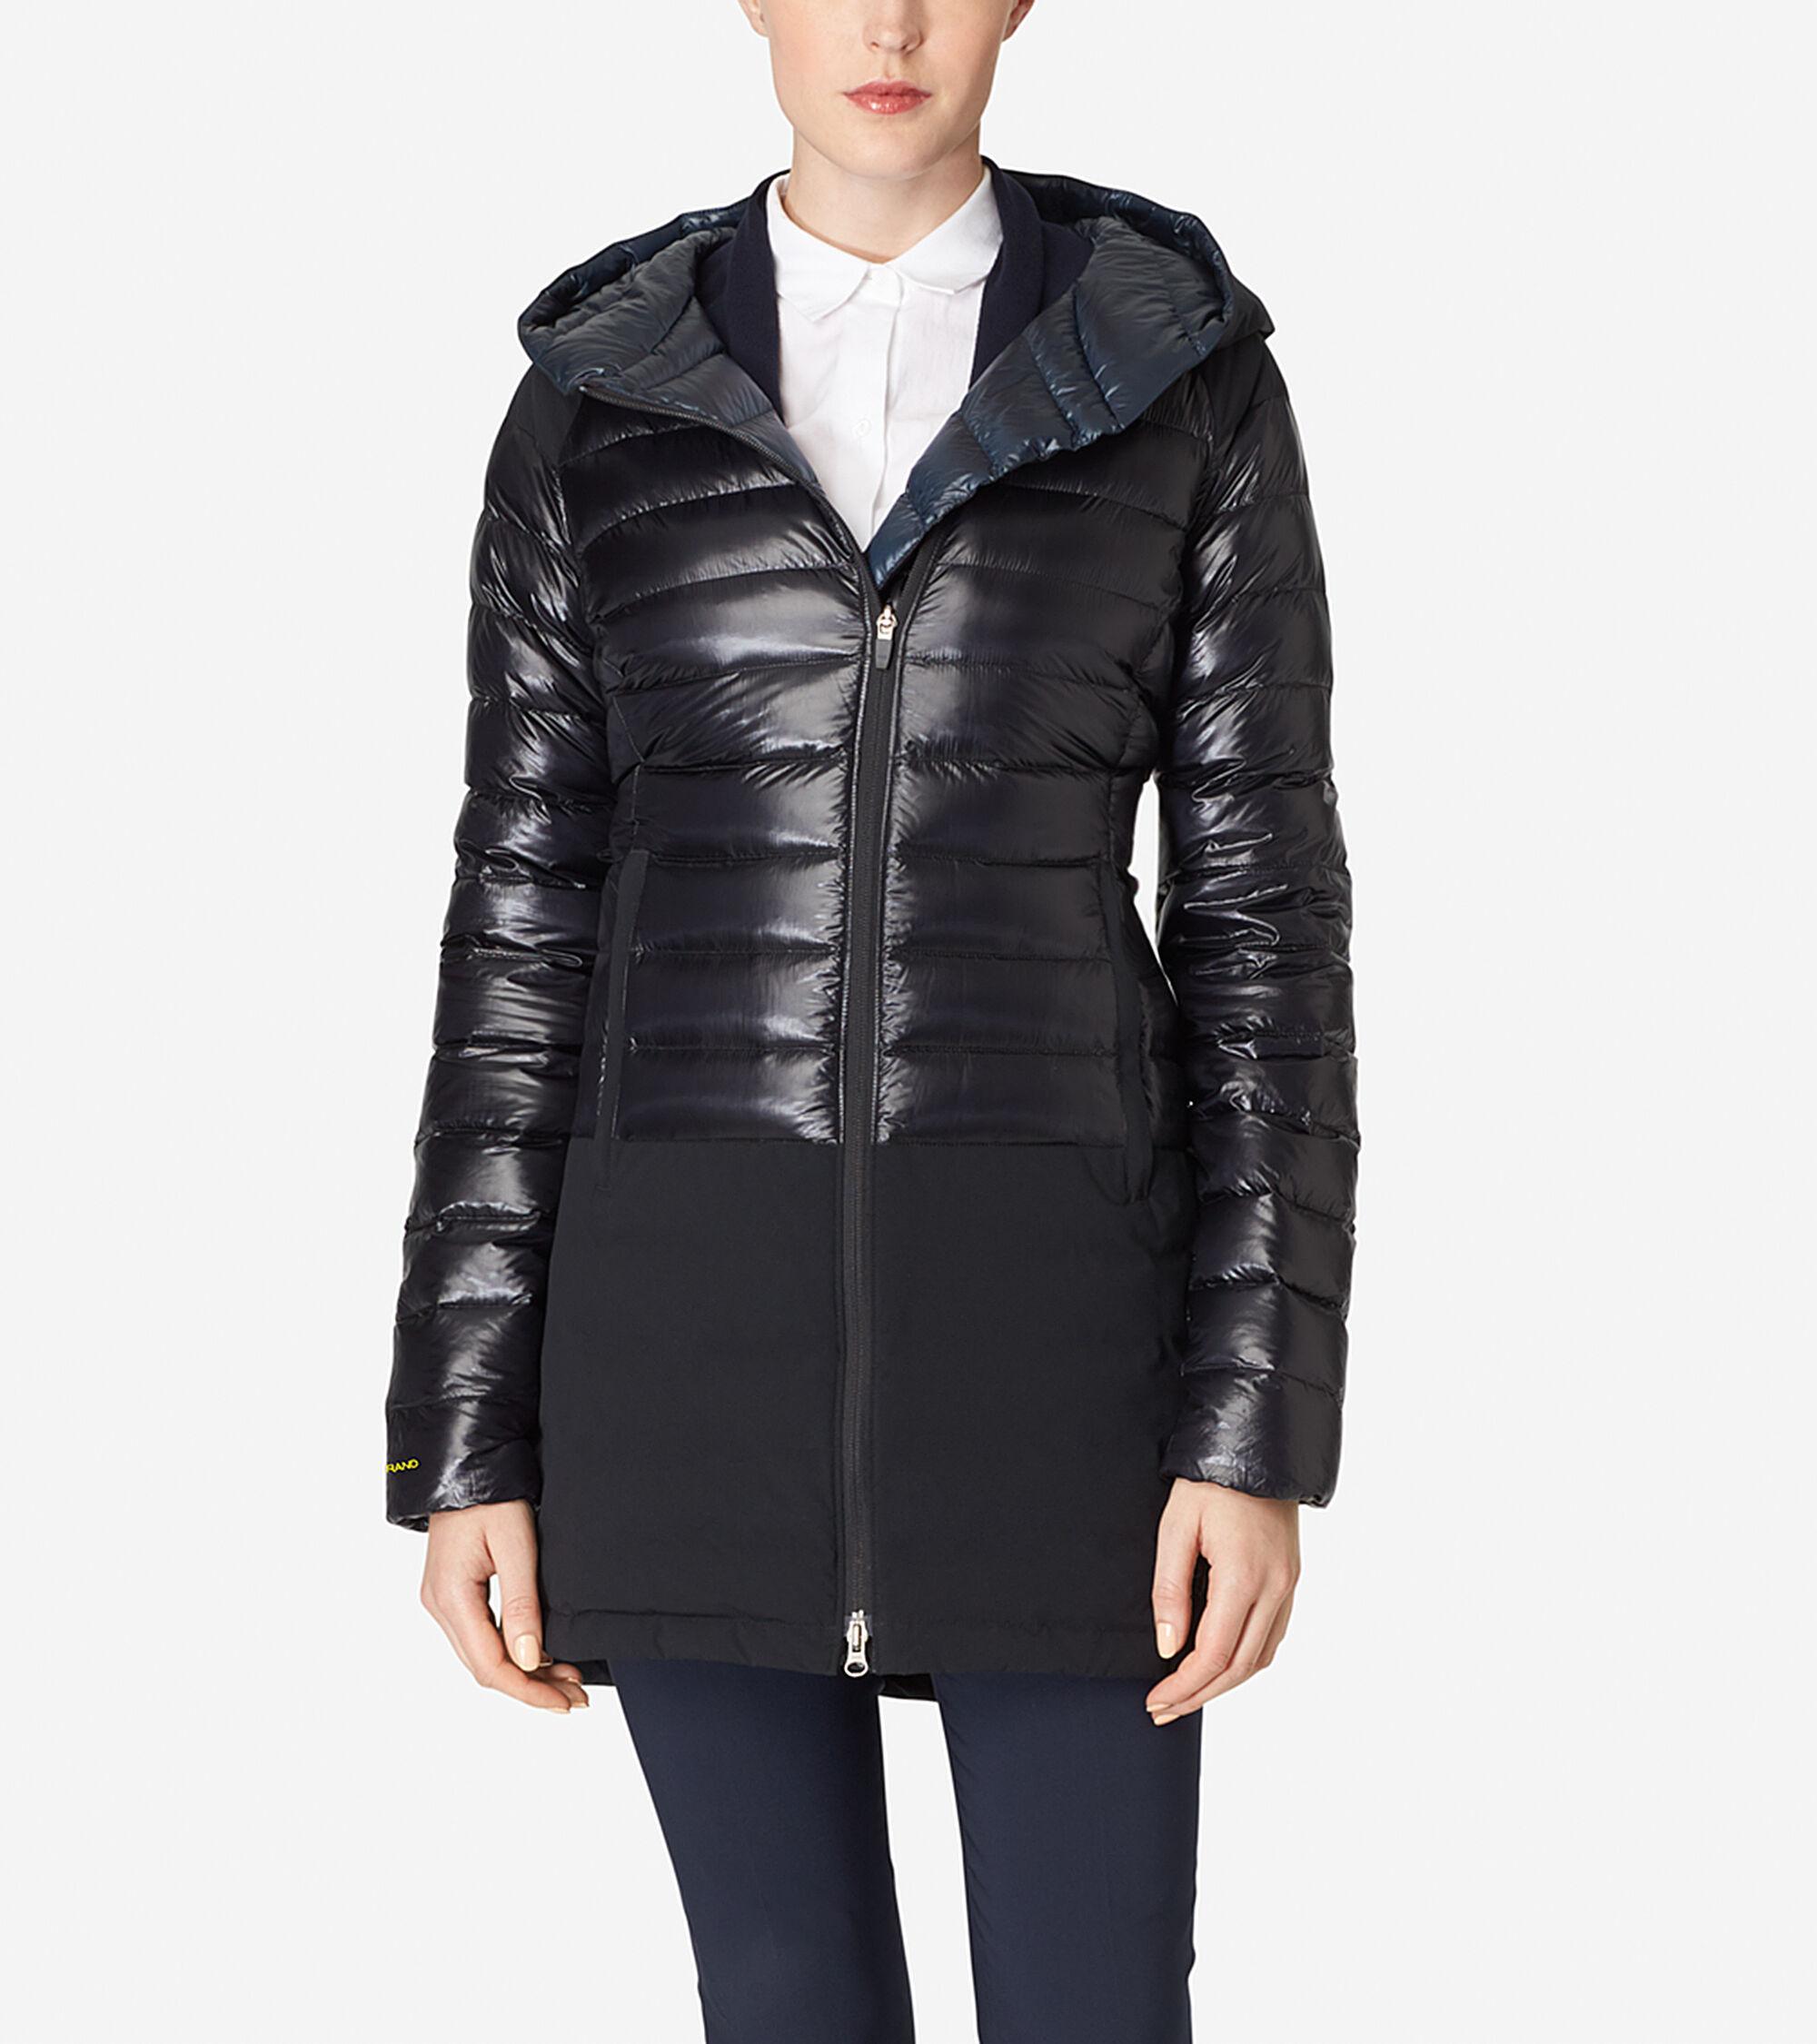 Leather jacket repair ottawa - Zer Grand Funnel